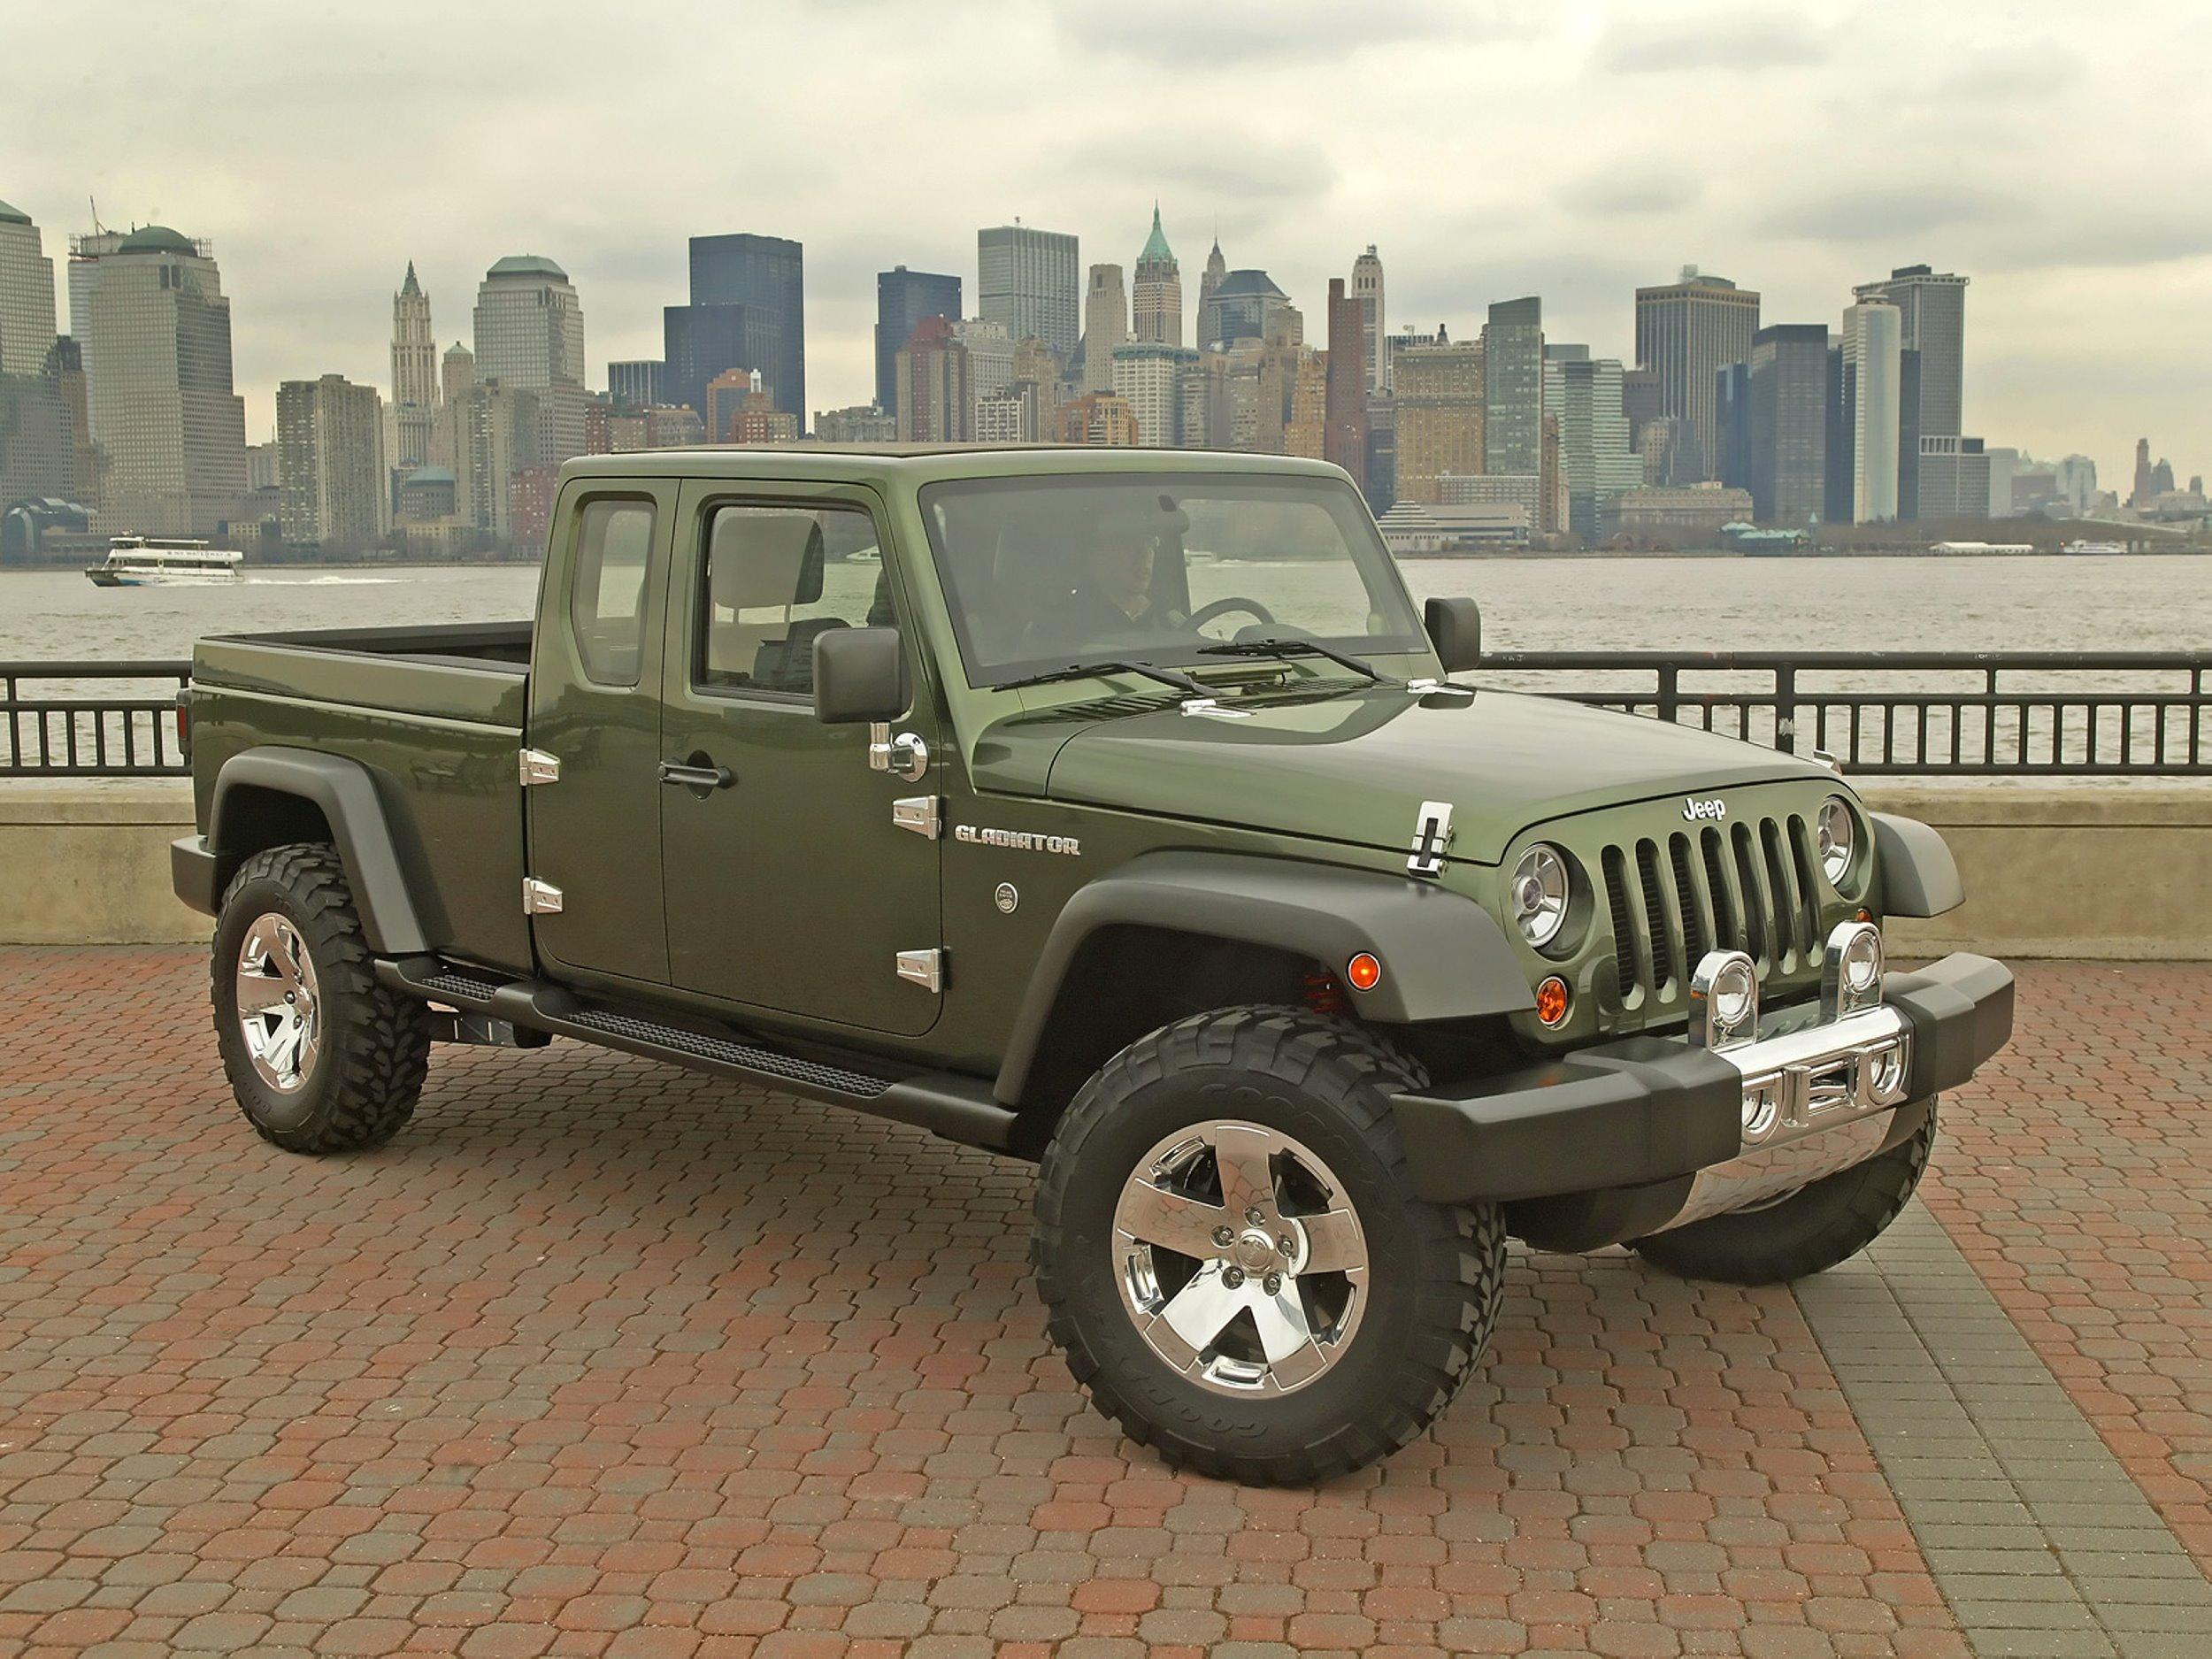 autowp.ru jeep gladiator concept 8.jpg jeep gladiator concept 8